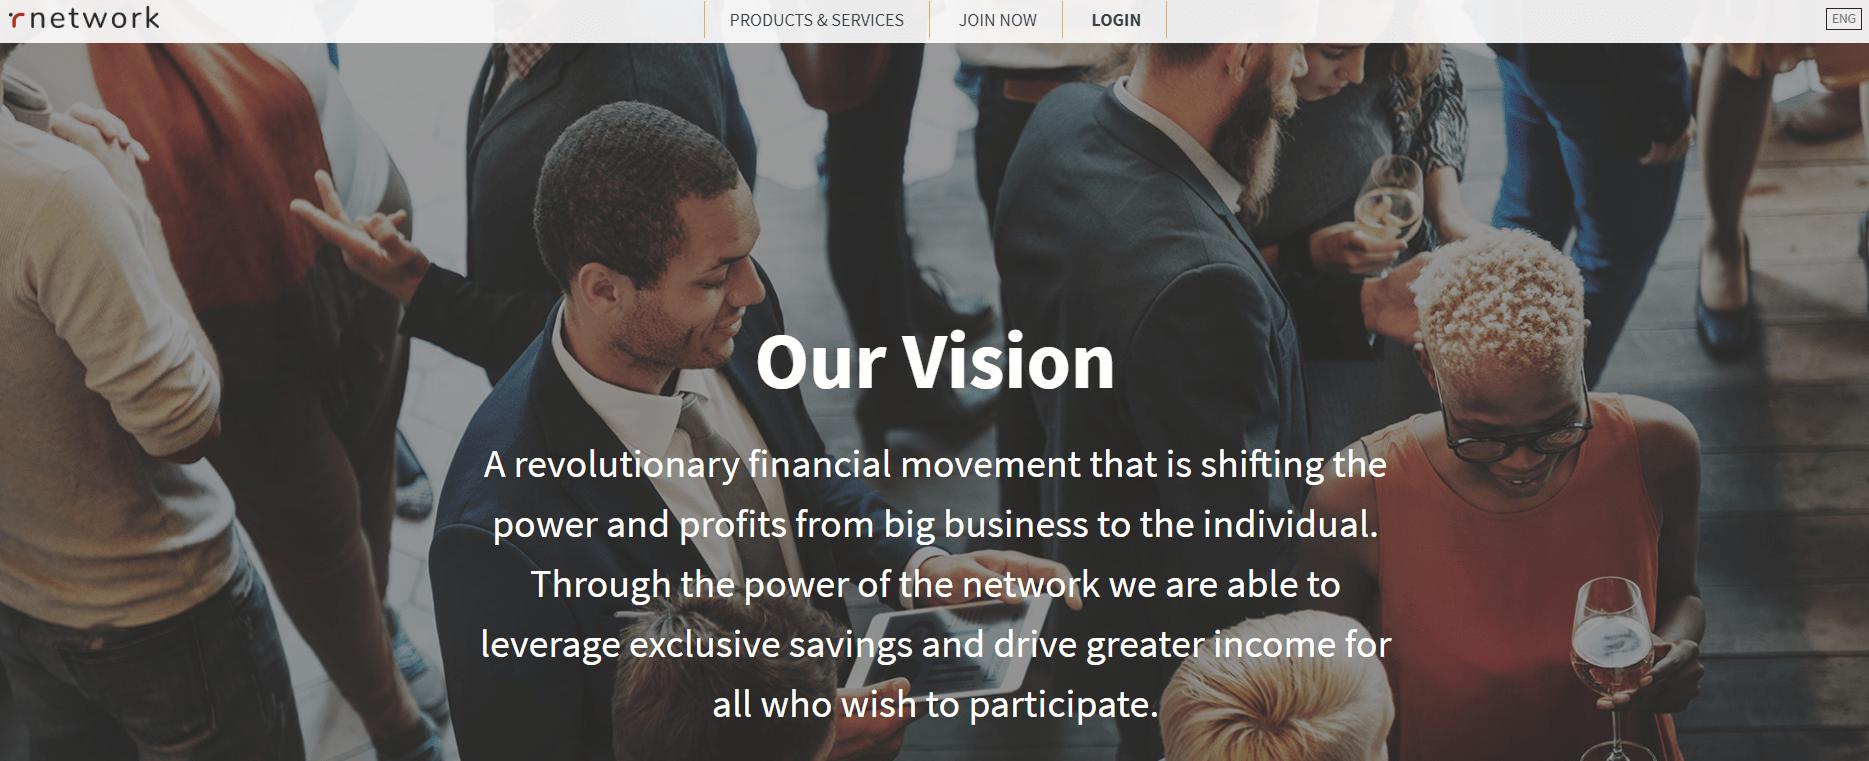 r network website